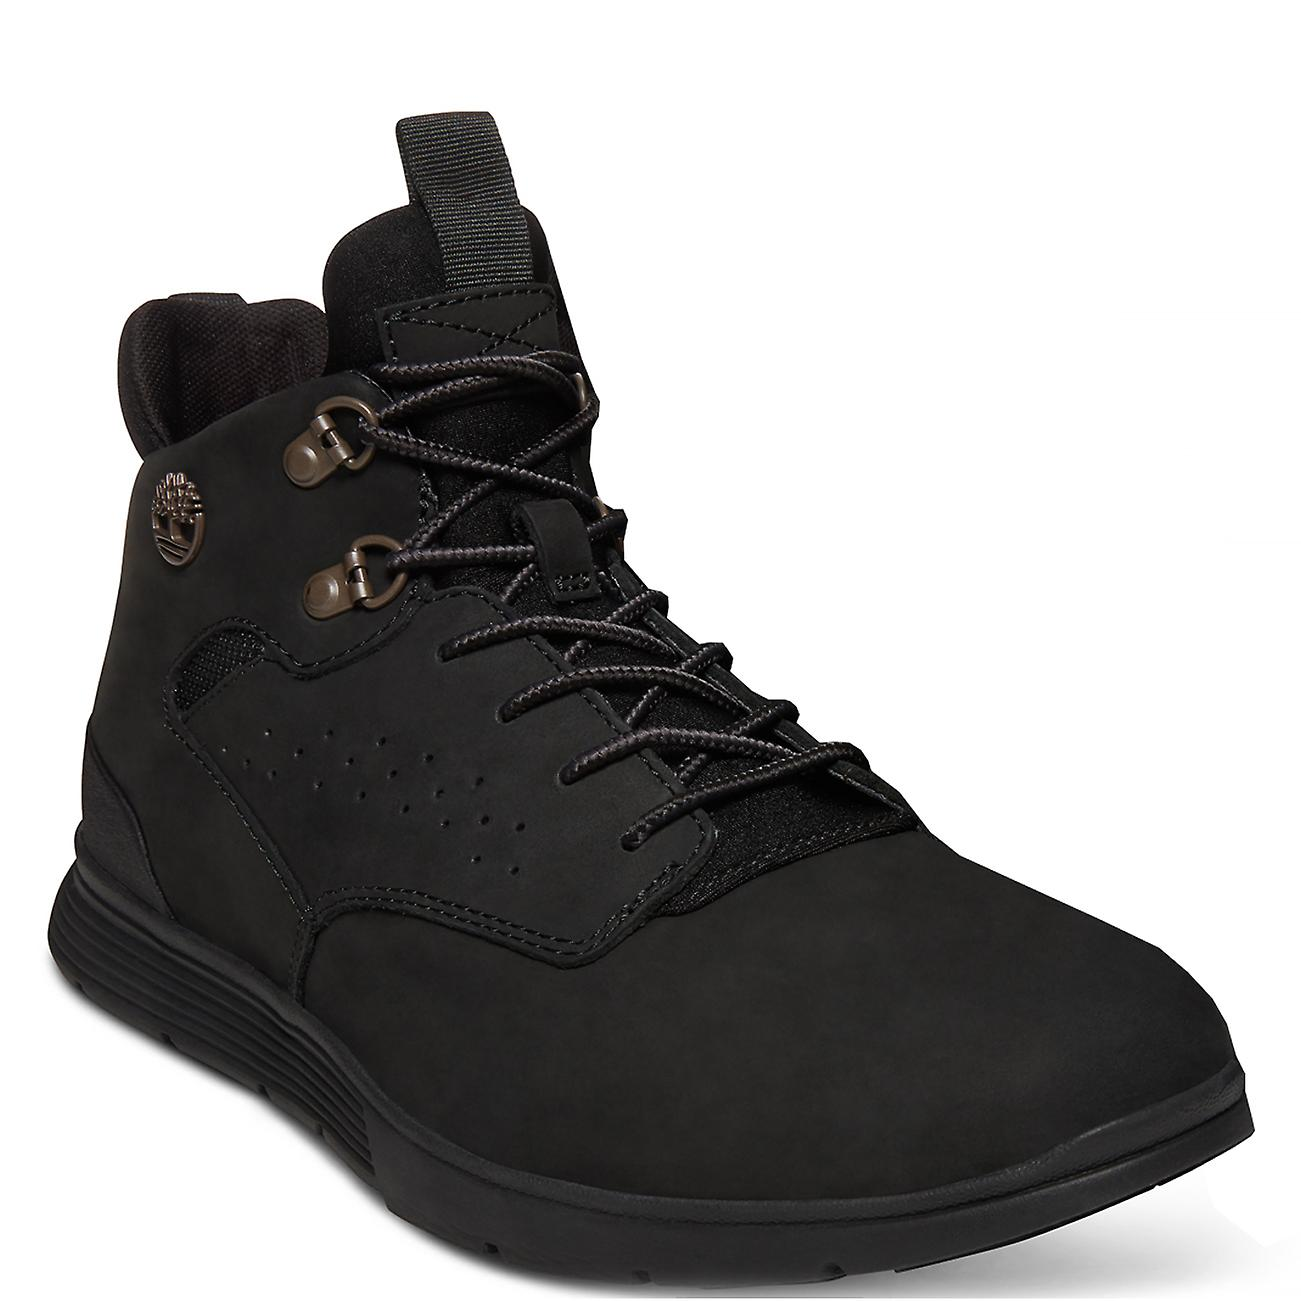 neue Stile Online gehen Qualität Mens Timberland Killington Hiker Chukka Boot Walking Lightweight Boots